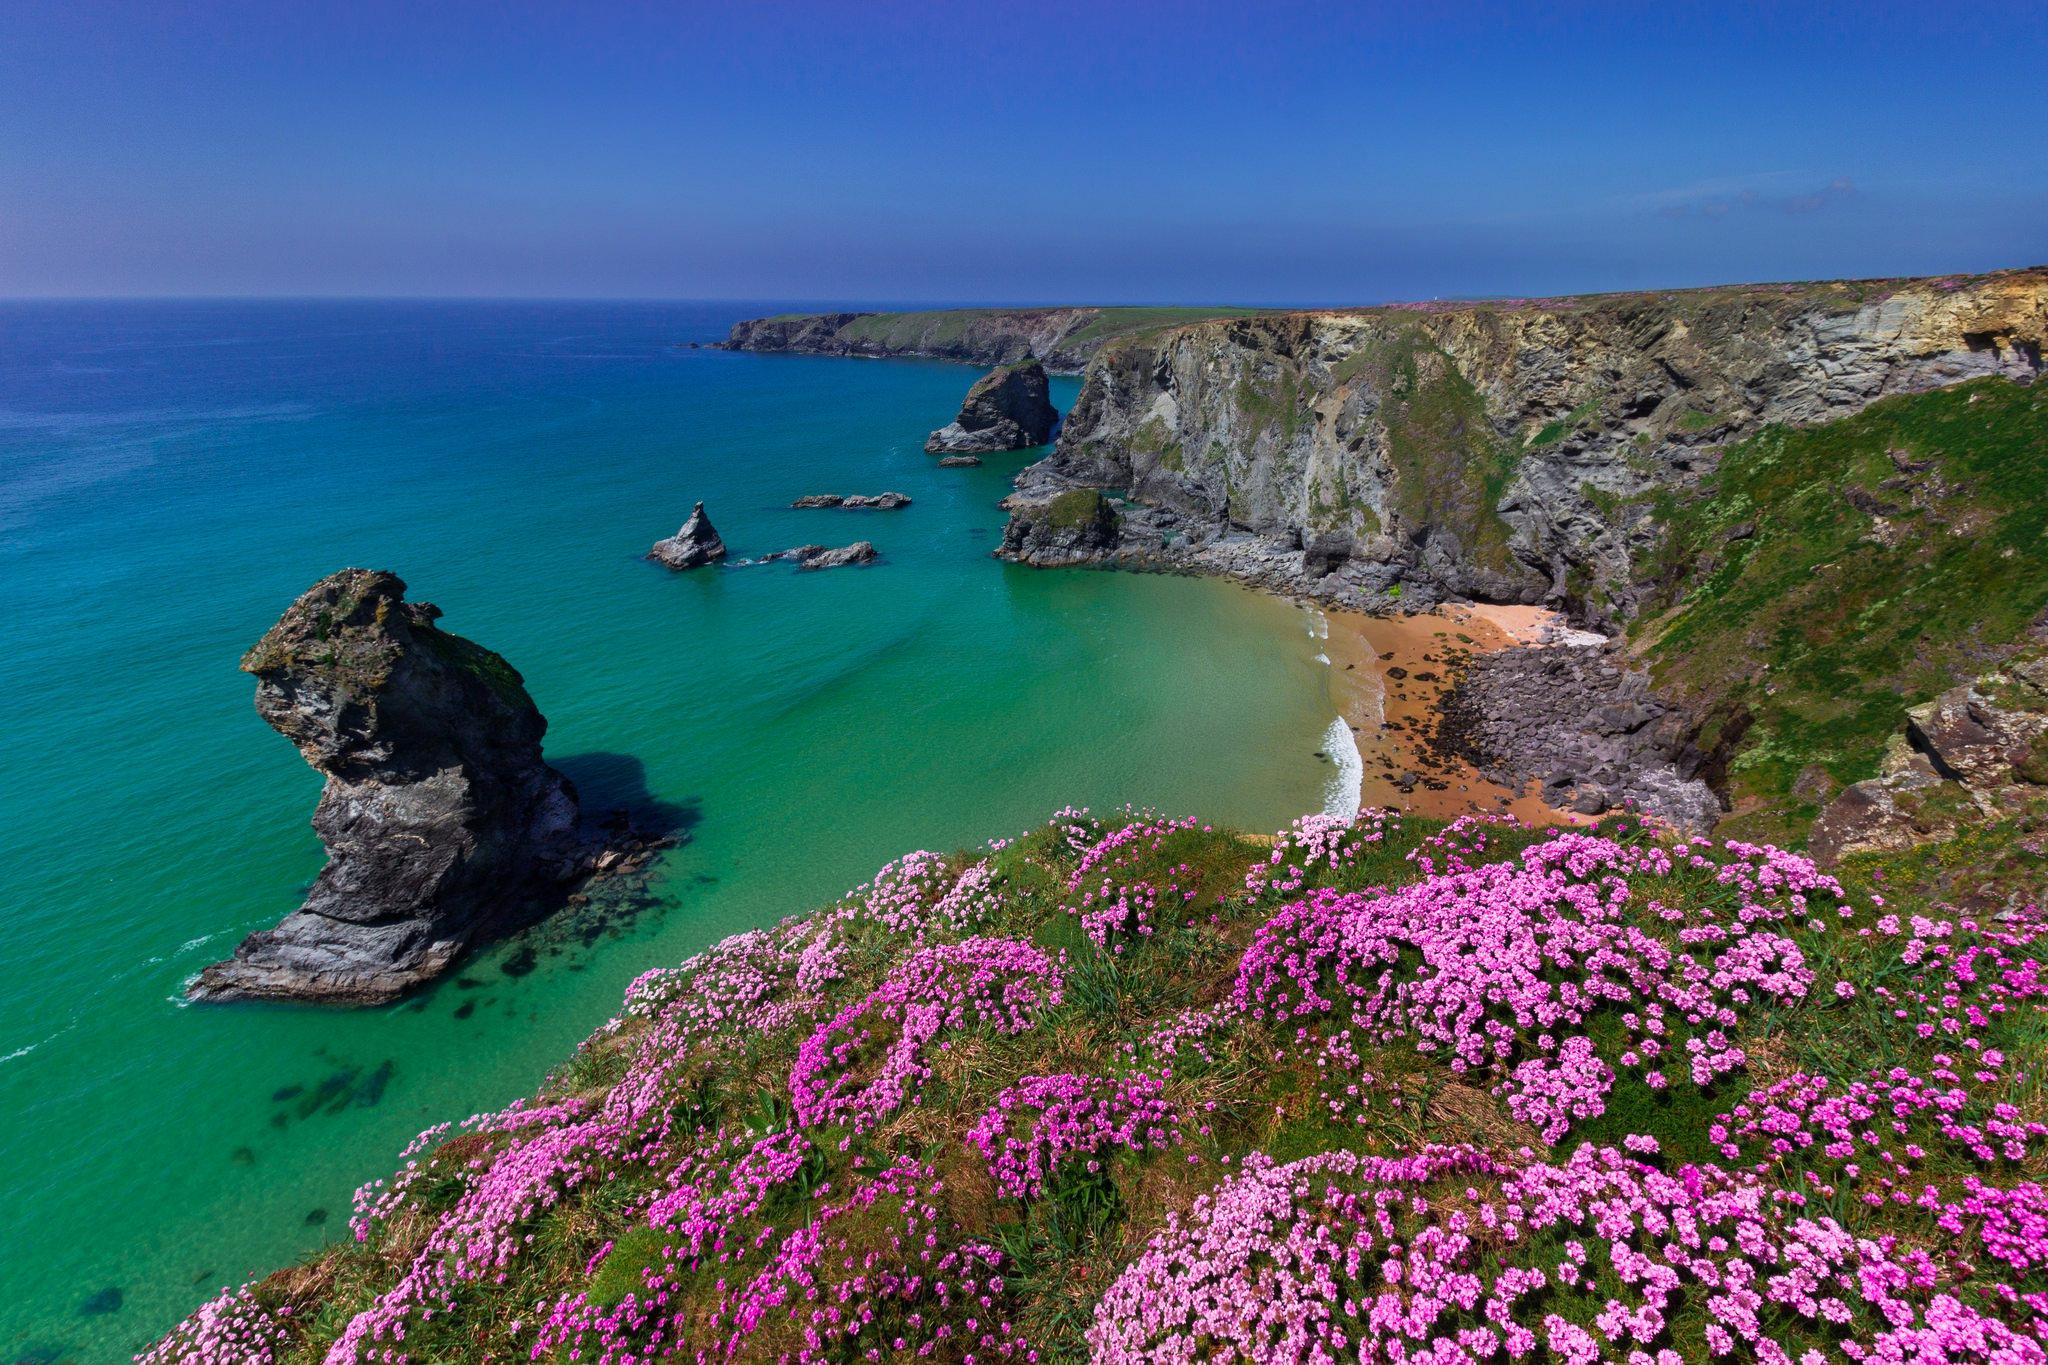 Coast of Cornwall England HD Wallpaper Background Image 2048x1365